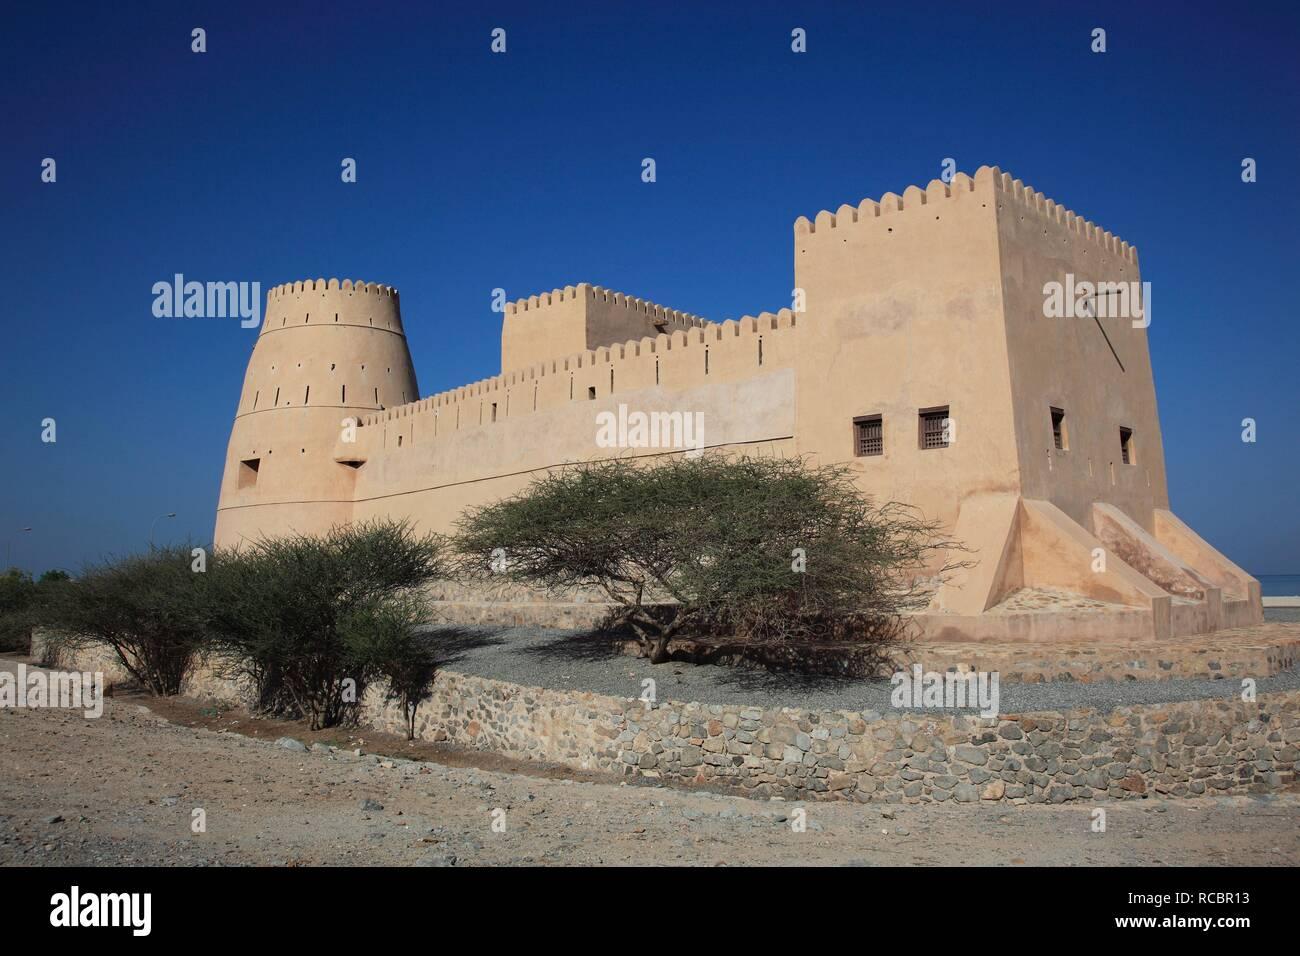 Bukha Fort, Bukha, in the Omani enclave of Musandam, Oman, Arabian Peninsula, Middle East, Asia Stock Photo